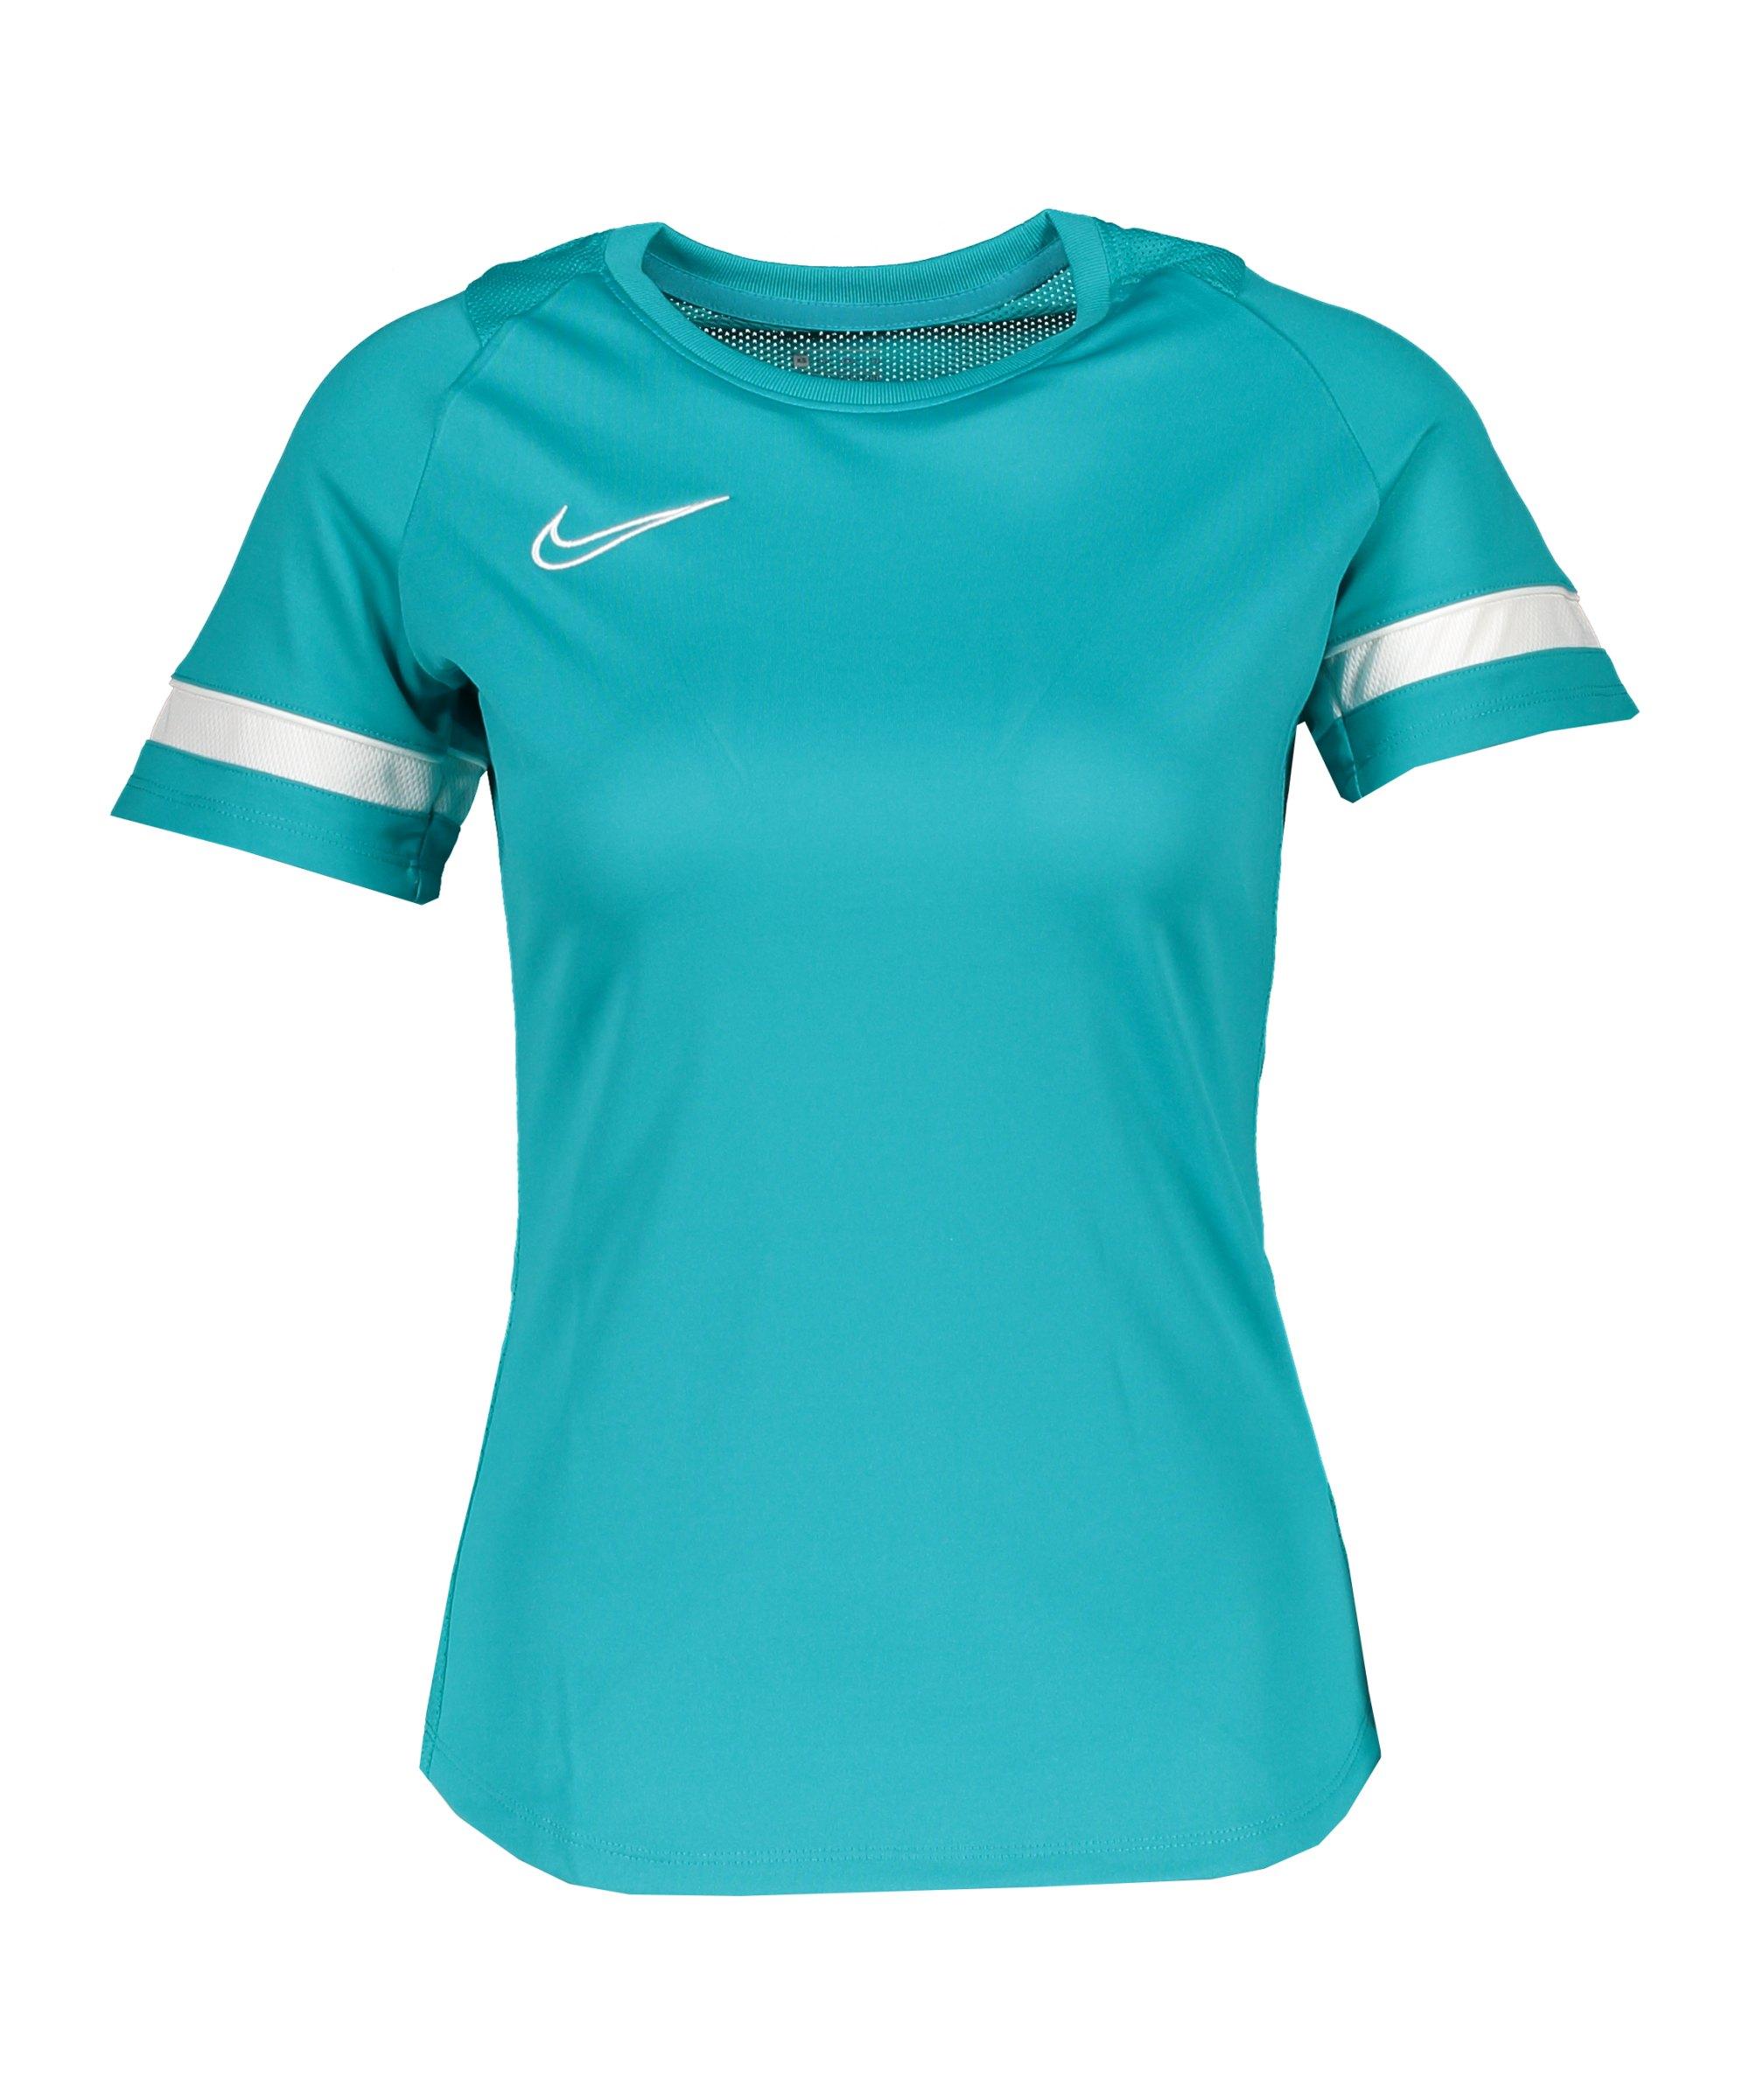 Nike Academy 21 T-Shirt Damen Blau Weiss F356 - tuerkis